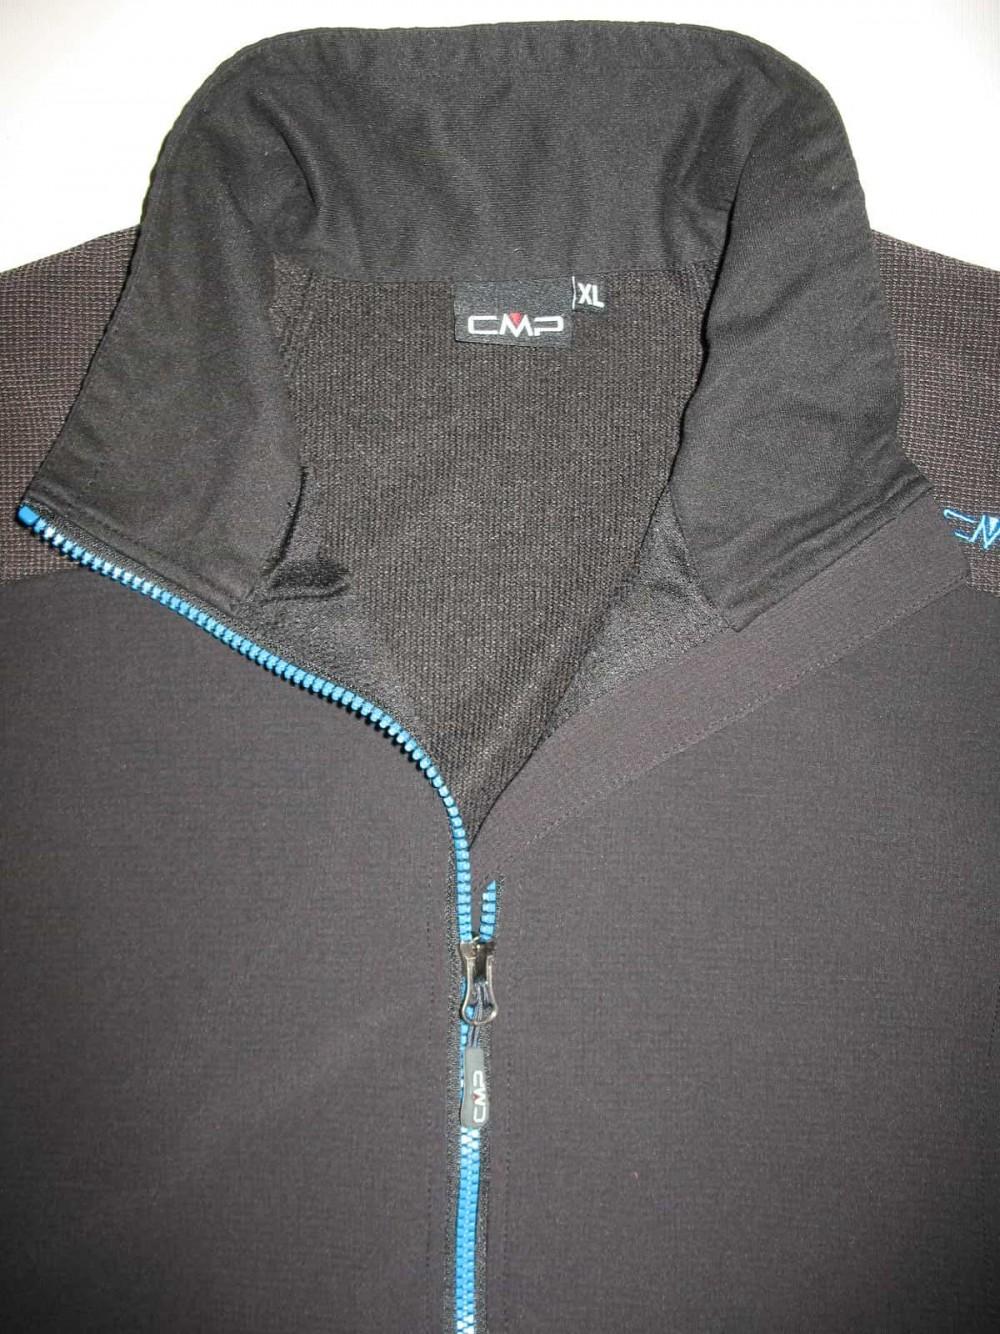 Куртка CMP extreme performance softshell jacket (размер L) - 3